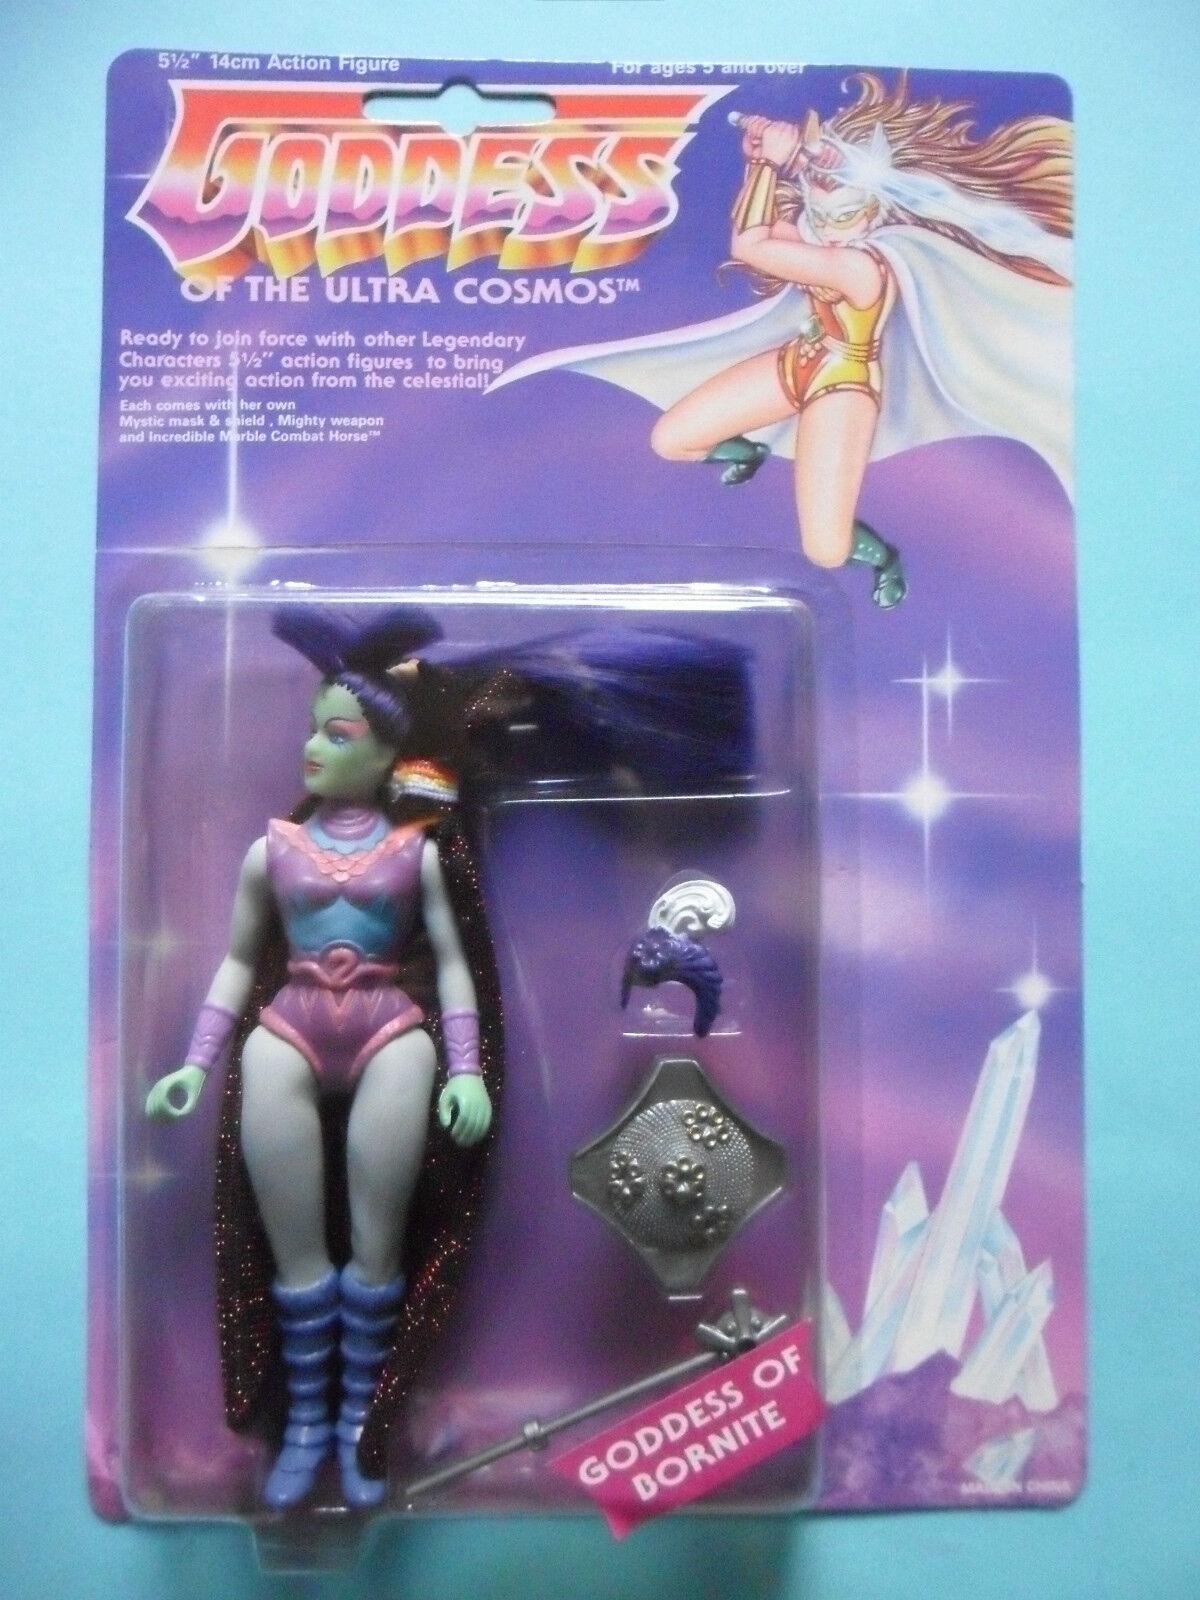 Göttin der ultra - kosmos göttin der bornite Stiefelleg abbildung moc motu she-ra